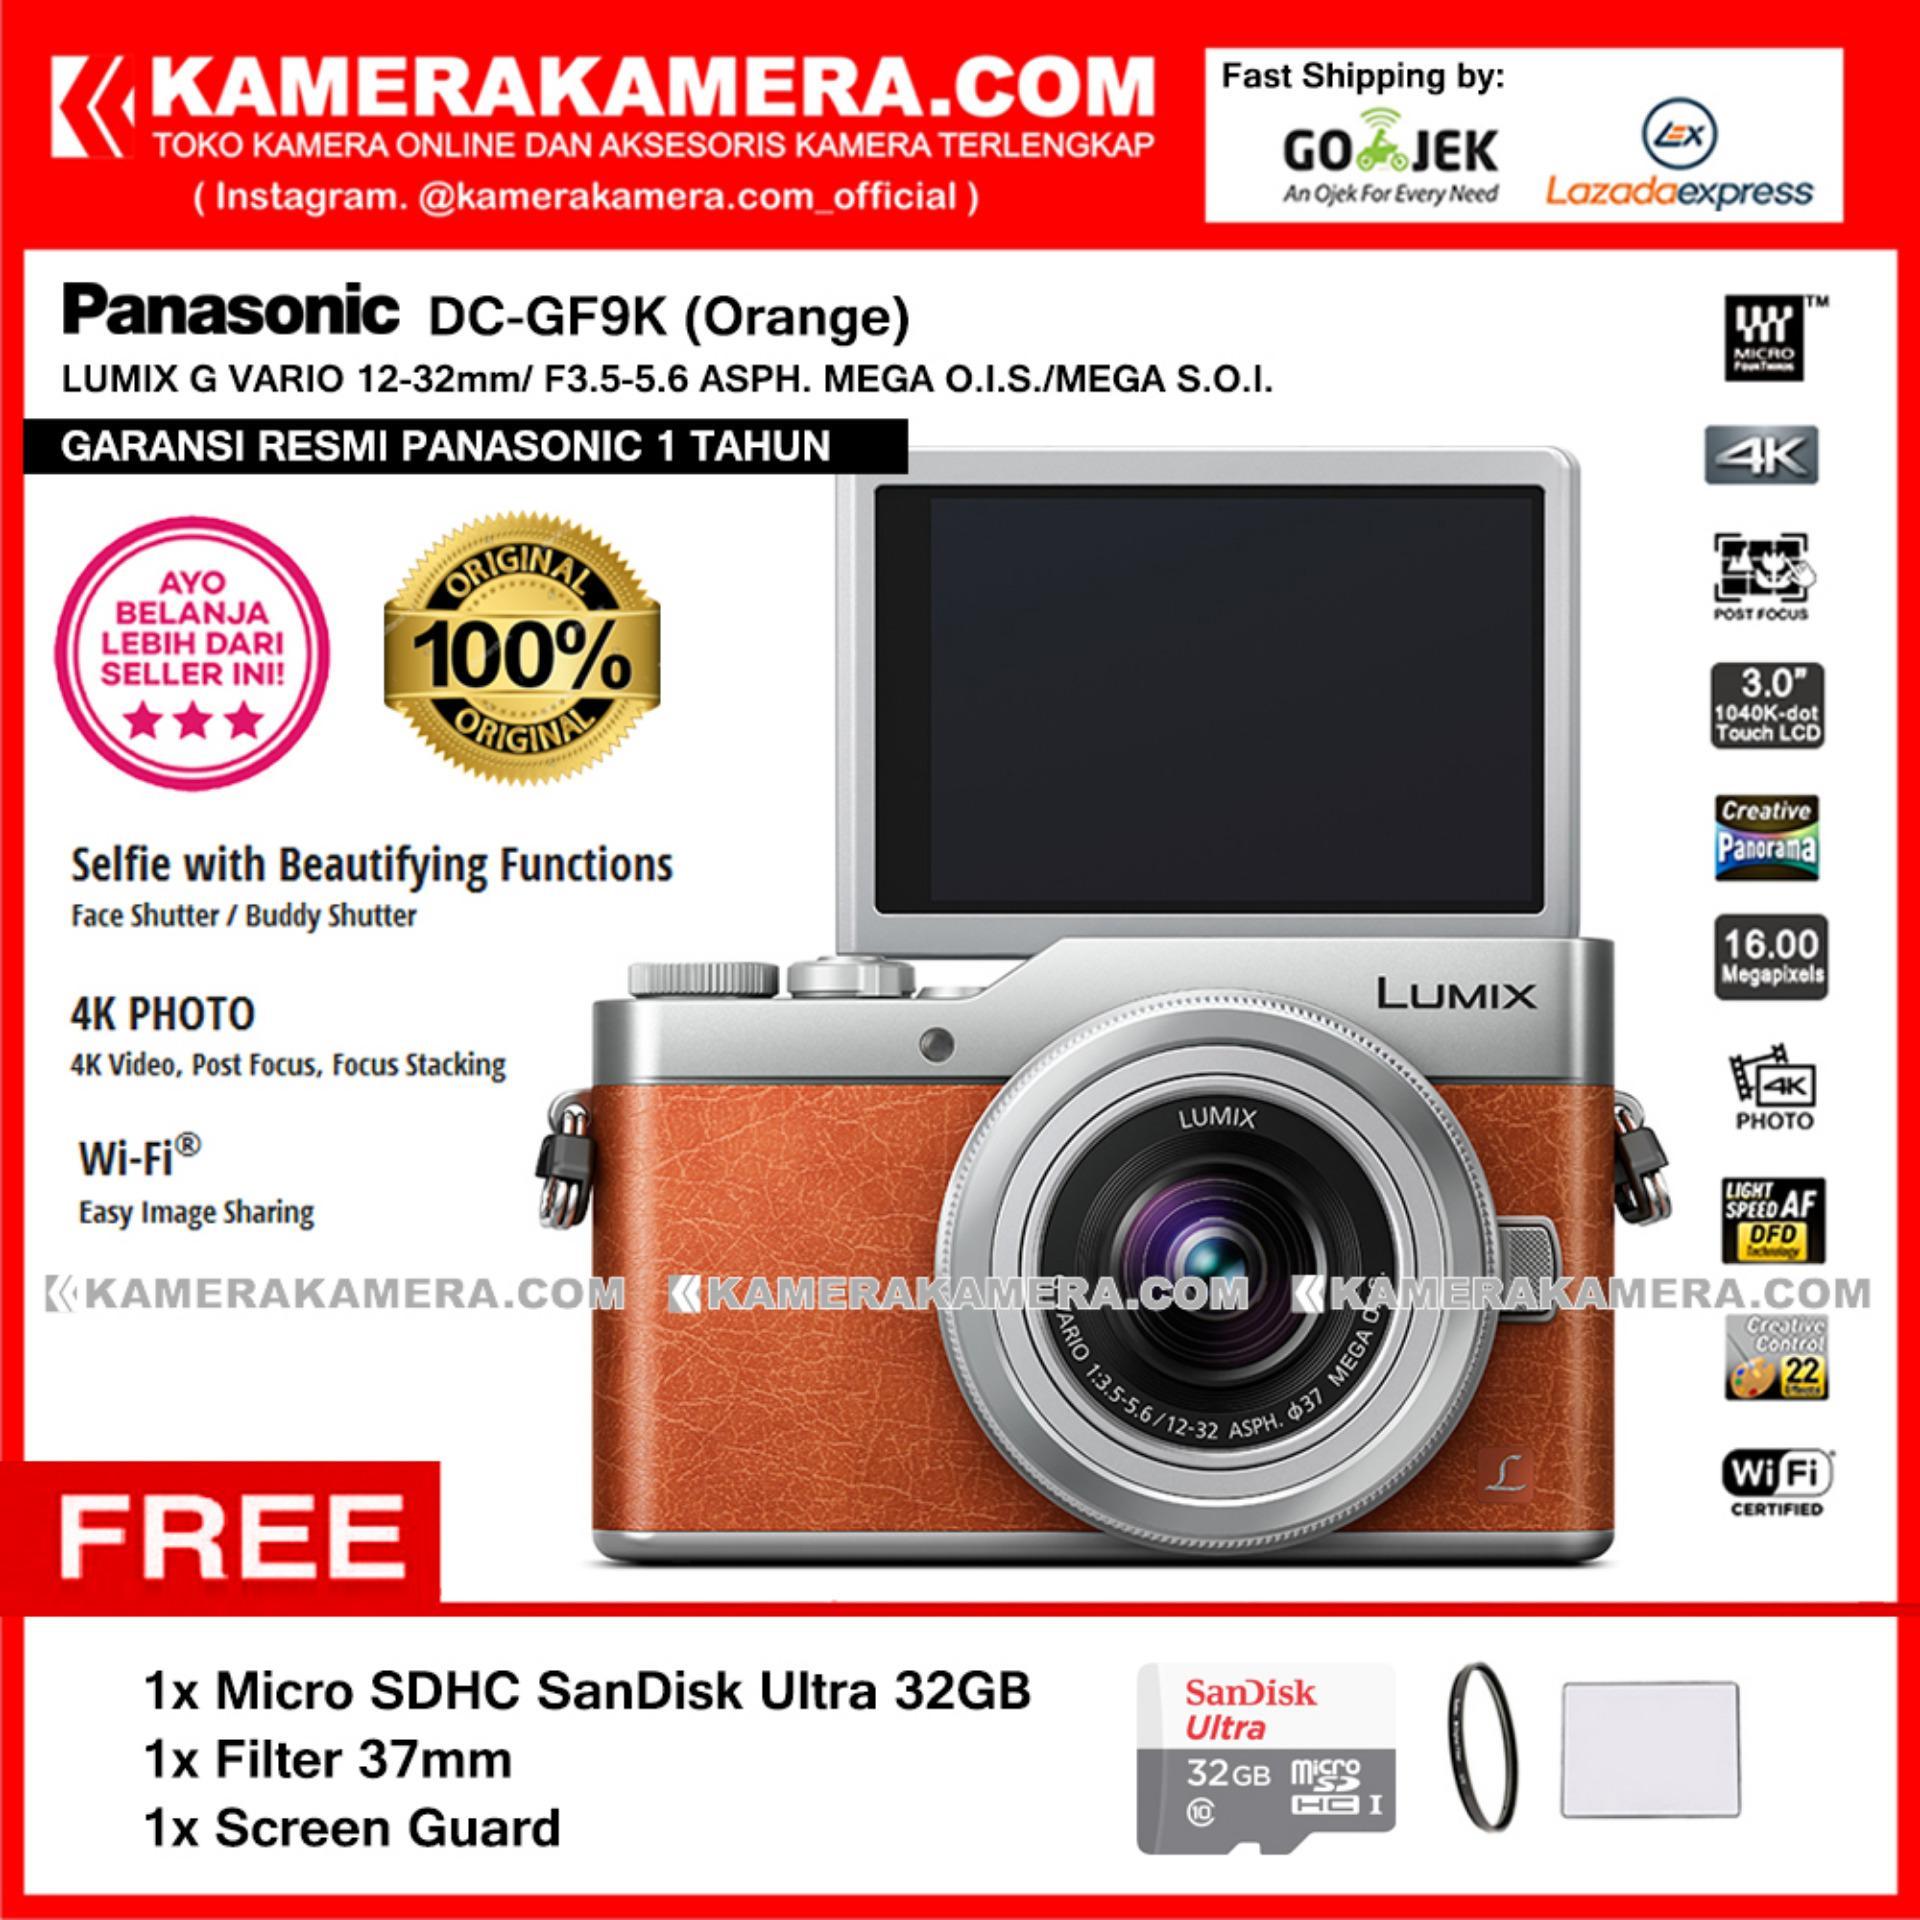 Daftar Harga Kamera Mirrorless 4k Terbaru Desember 2018 Panasonic Lumix Gx85k Lensa 12 32mm Dmc Gx85 Dc Gf9k Orange Camera Gf9 Post Focus 16mp Garansi Resmi